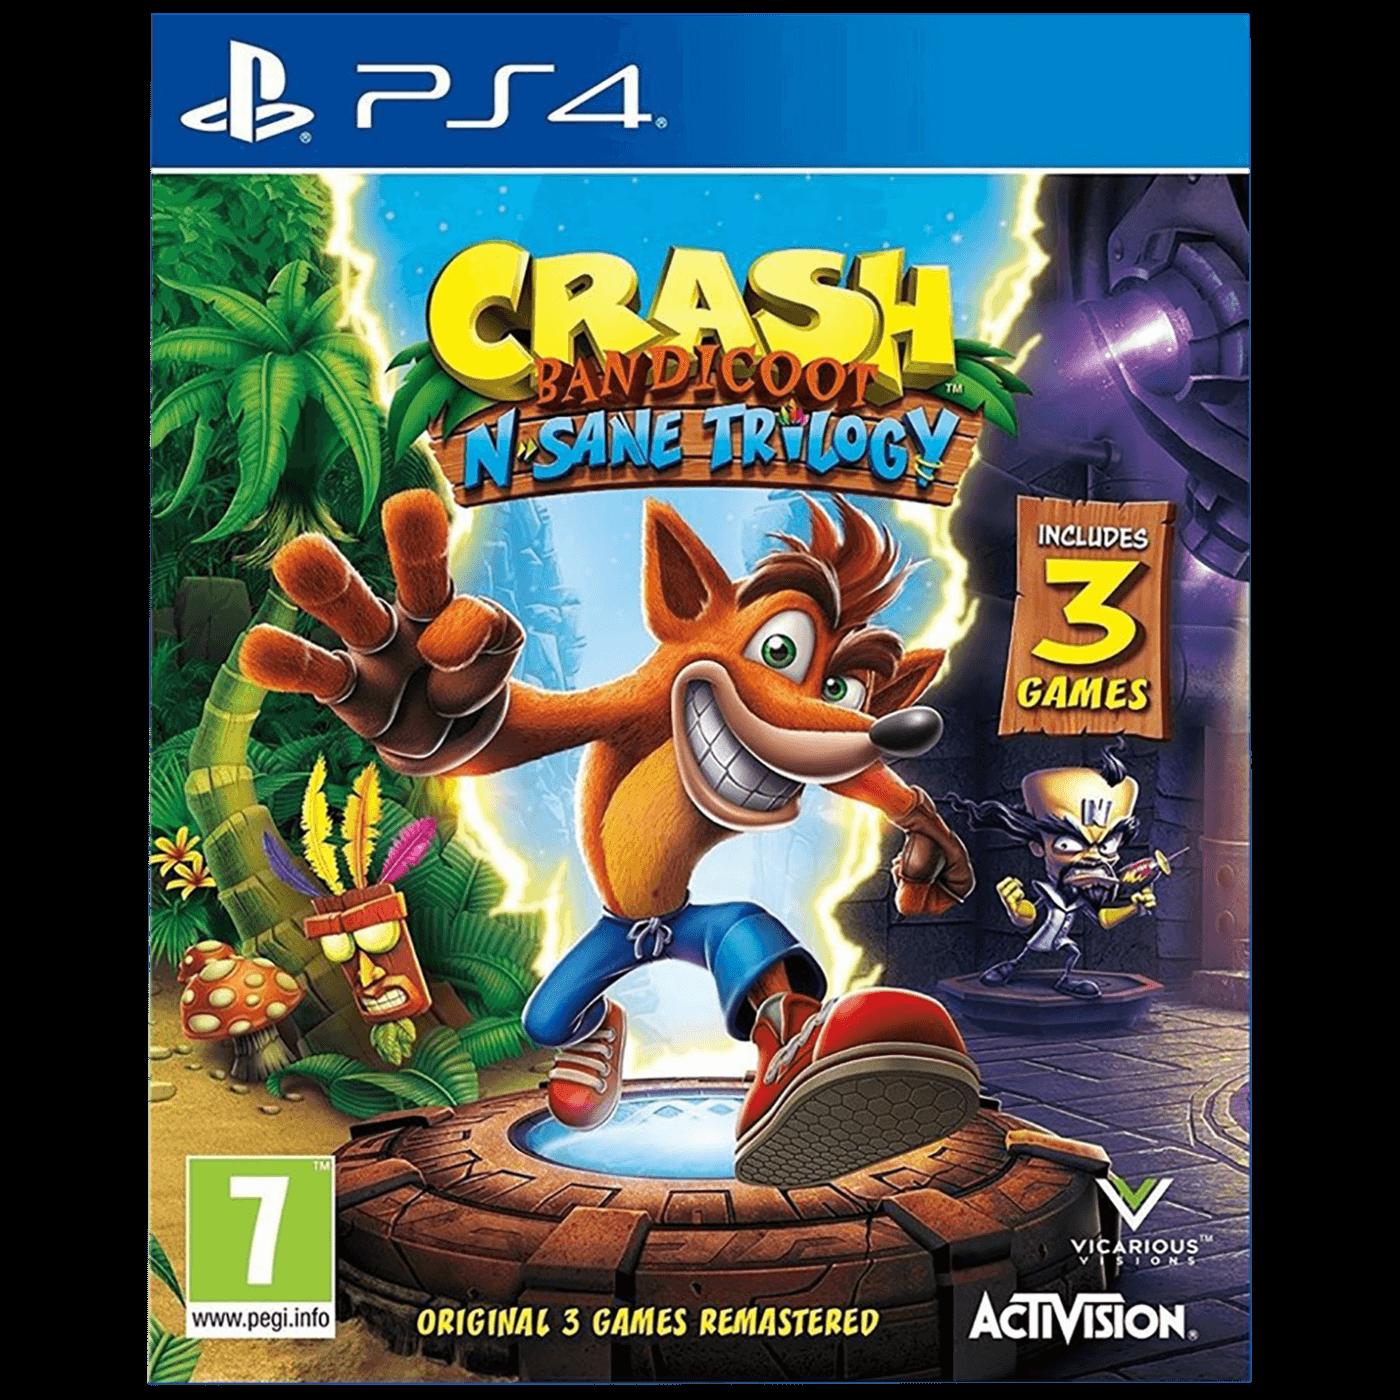 Igra PlayStation 4: Crash Bandicoot N. Sane Trilogy 2.0